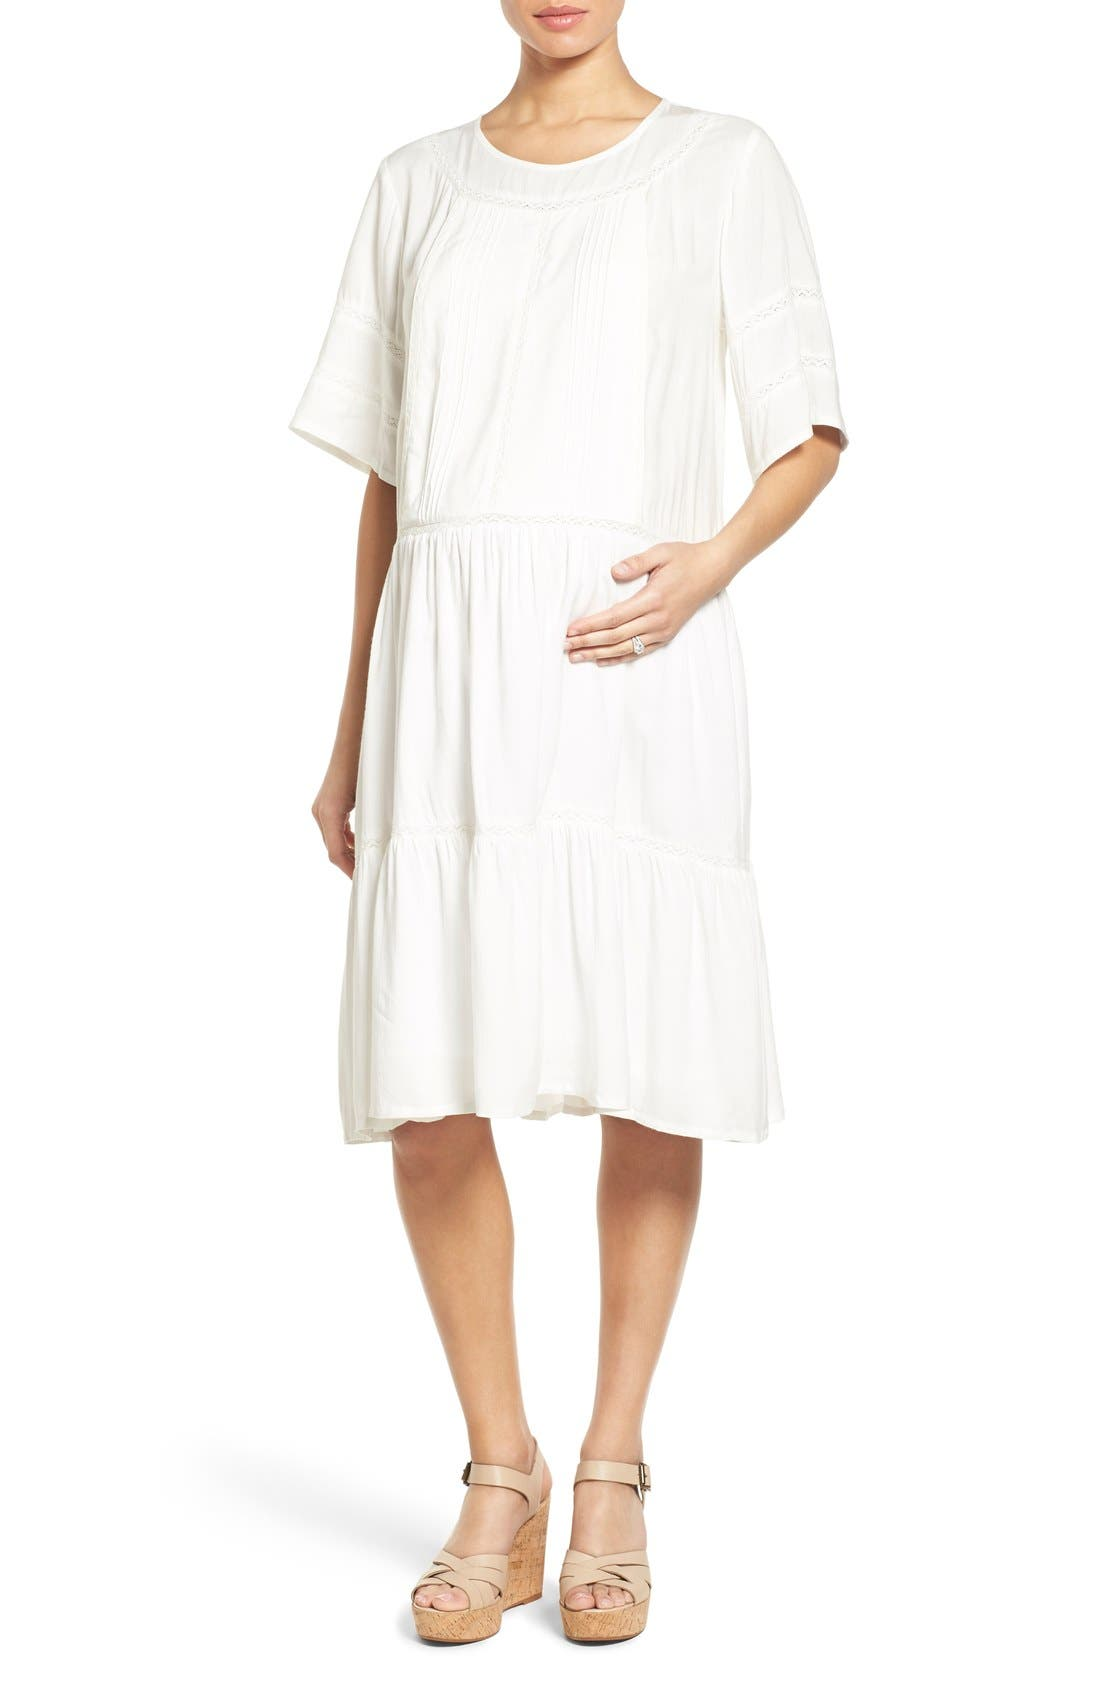 'Wild at Heart' Maternity/Nursing Midi Dress,                         Main,                         color,